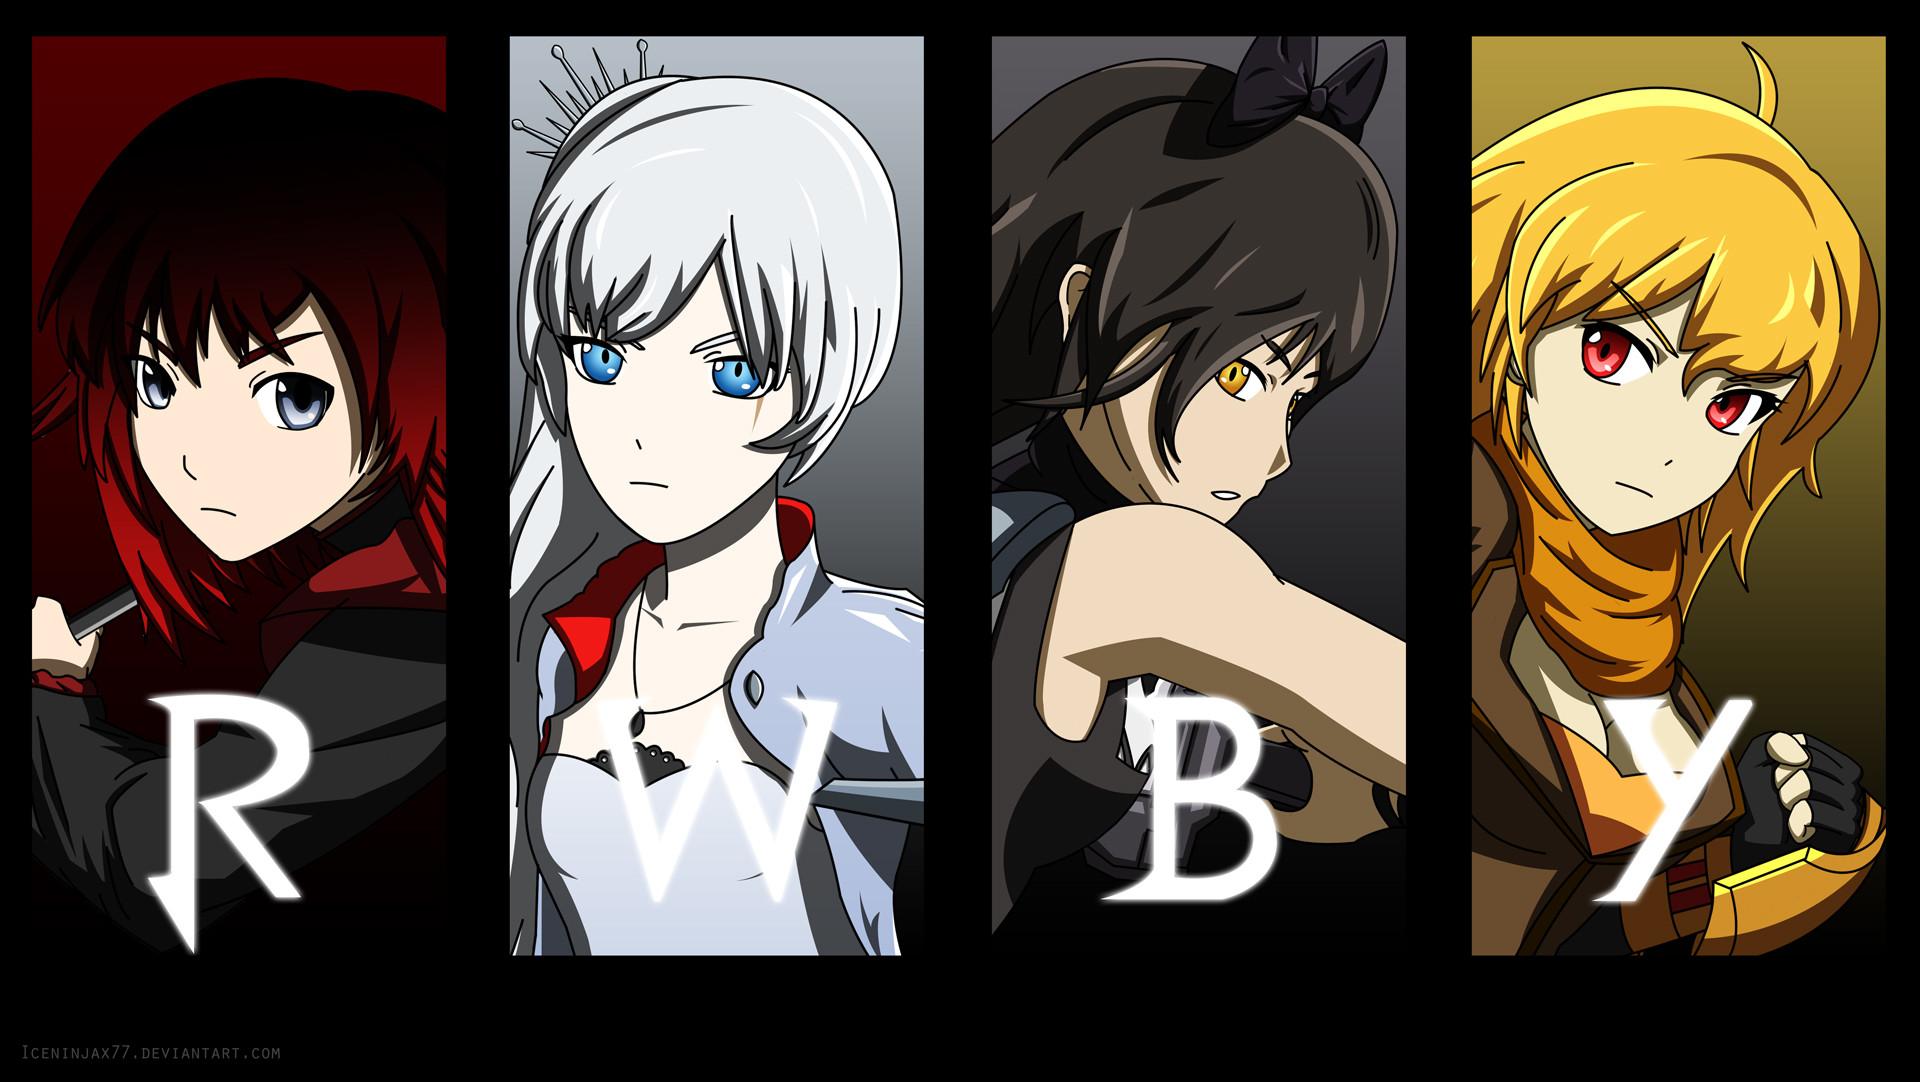 Anime RWBY wallpapers (Desktop, Phone, Tablet) – Awesome Desktop .